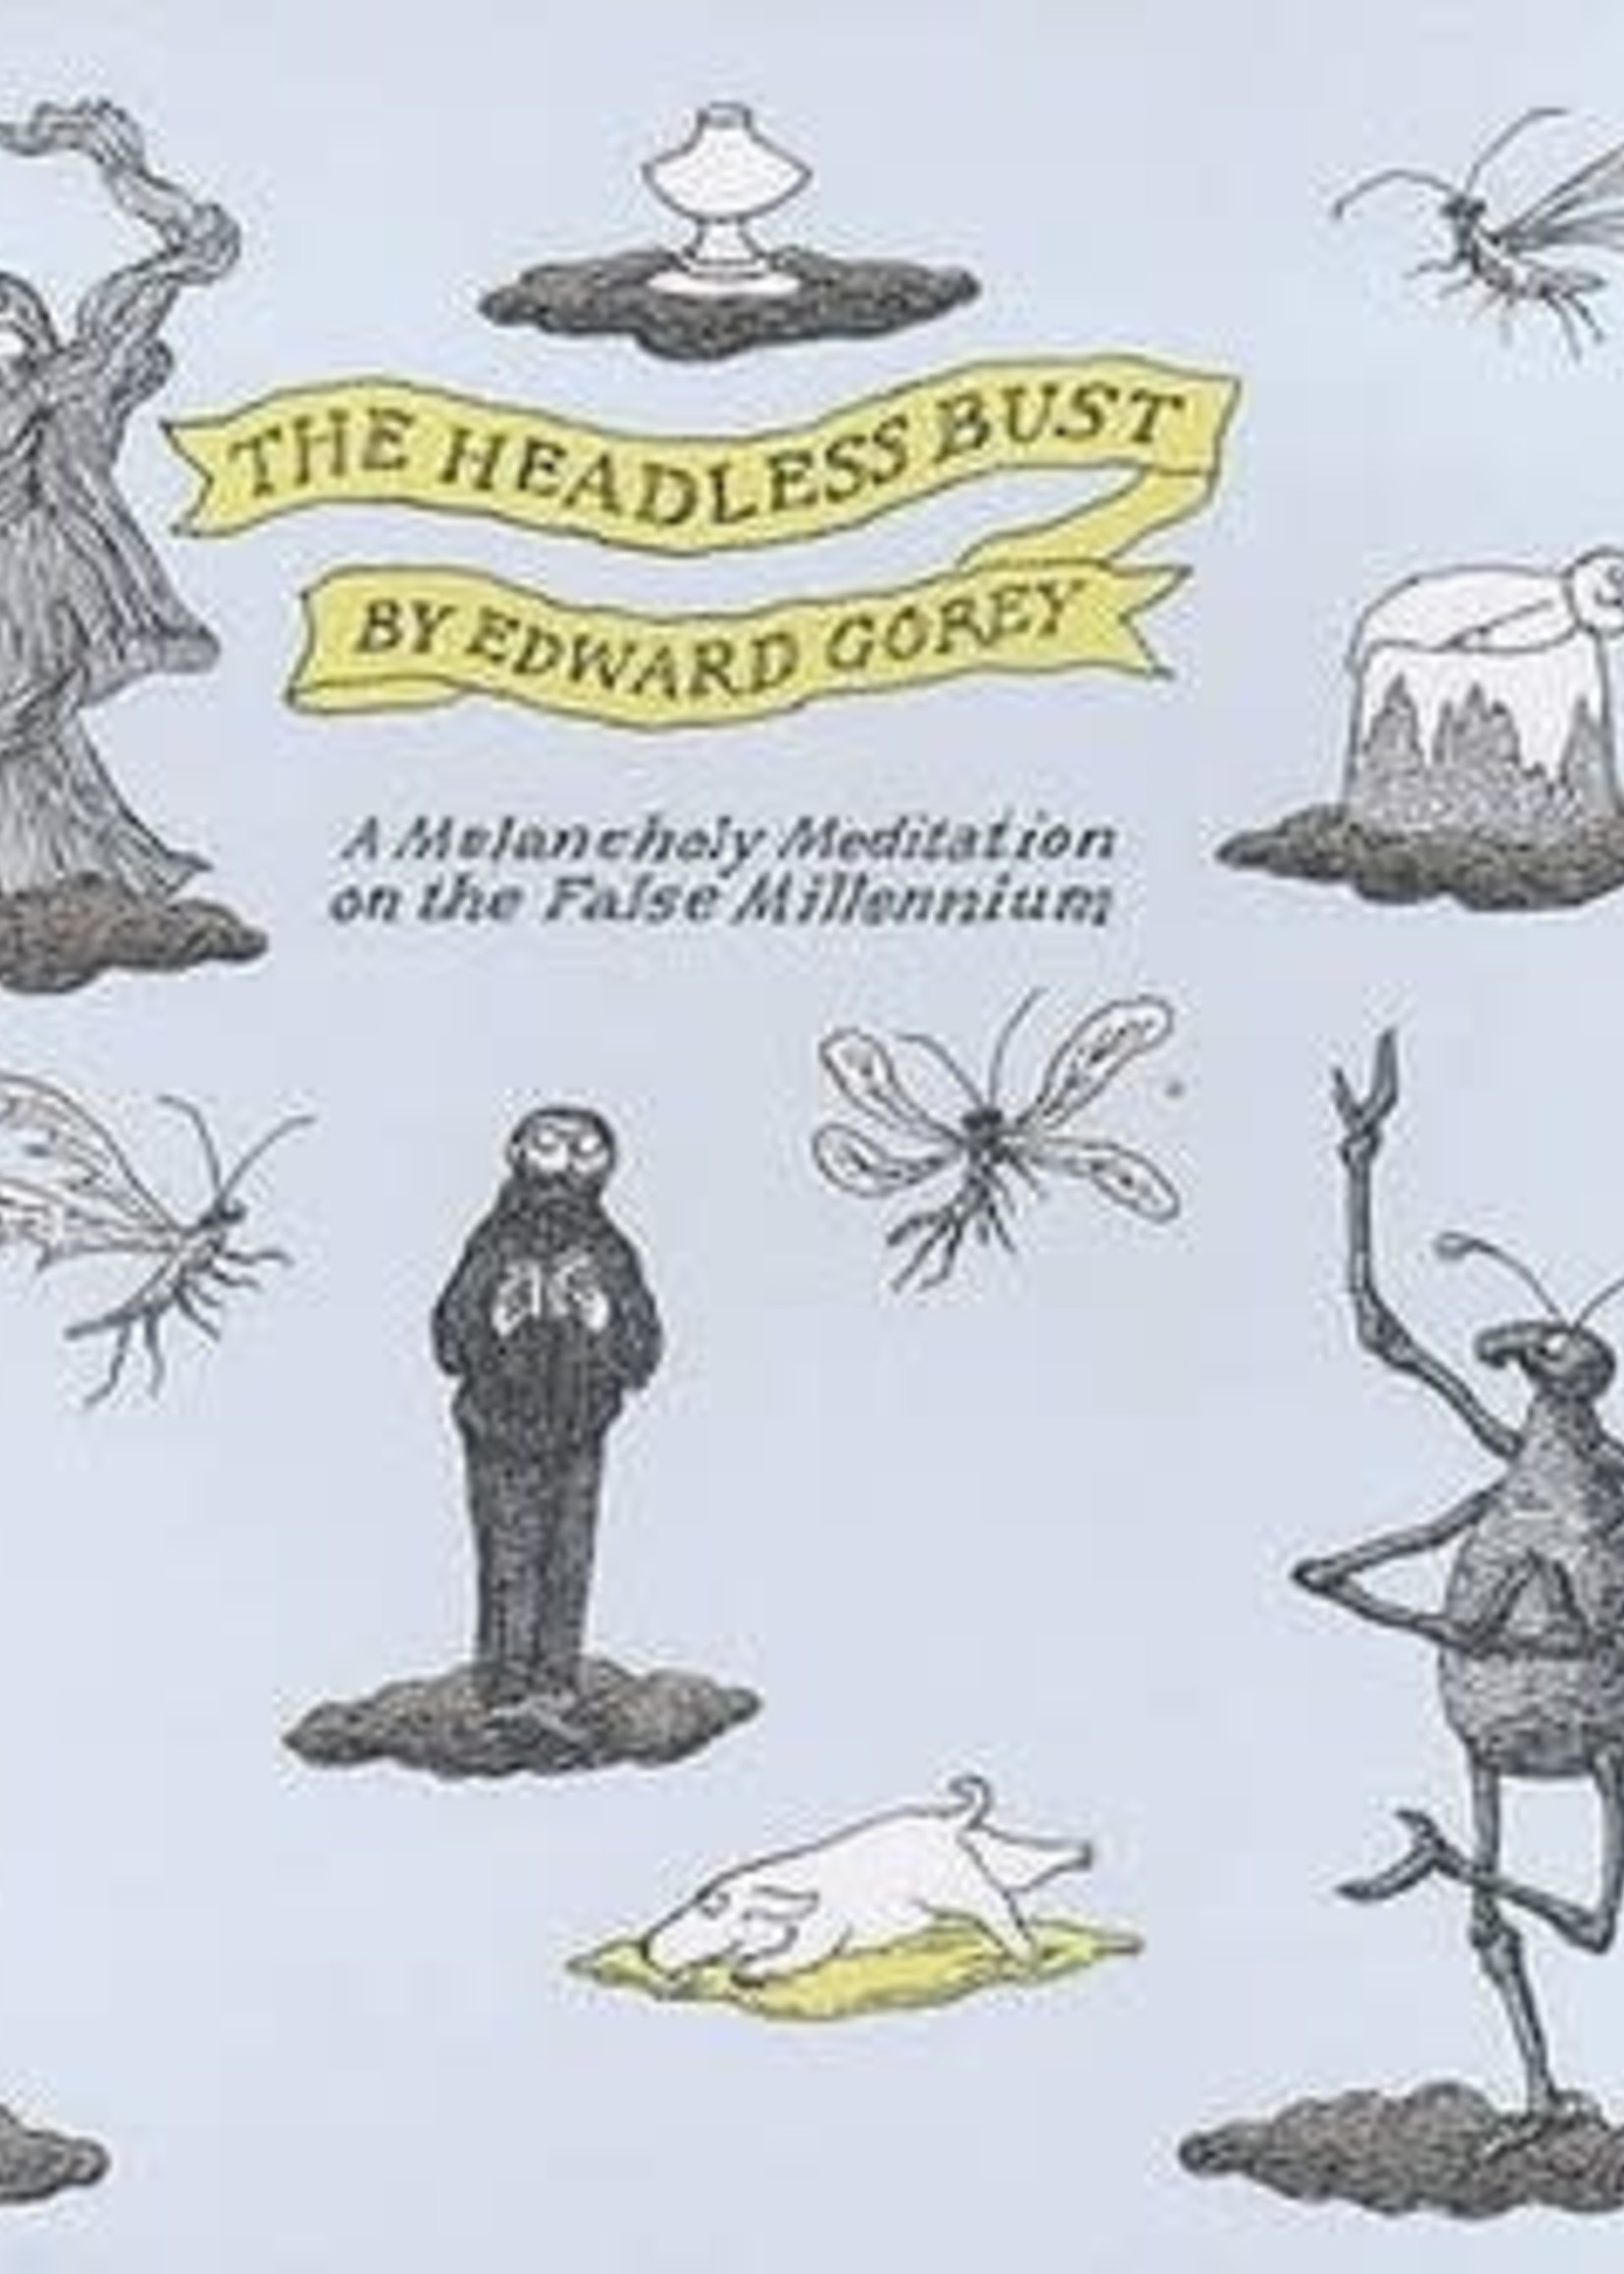 The Headless Bust: A Melancholy Meditation on the False Millennium by Edward Gorey